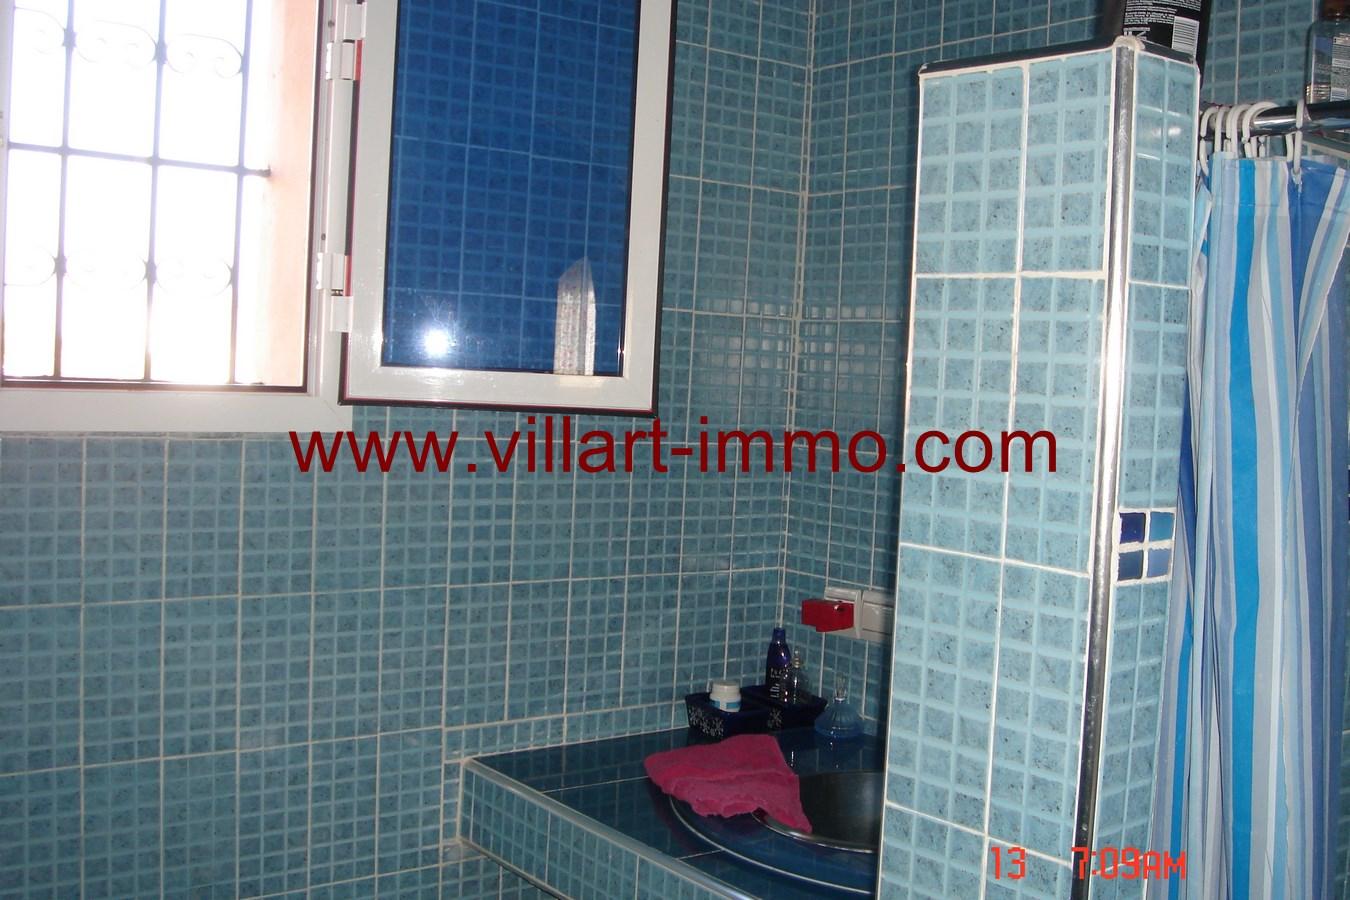 5-a-vendre-villa-tanger-hijriyin-salle-de-bain-vv430-villart-immo